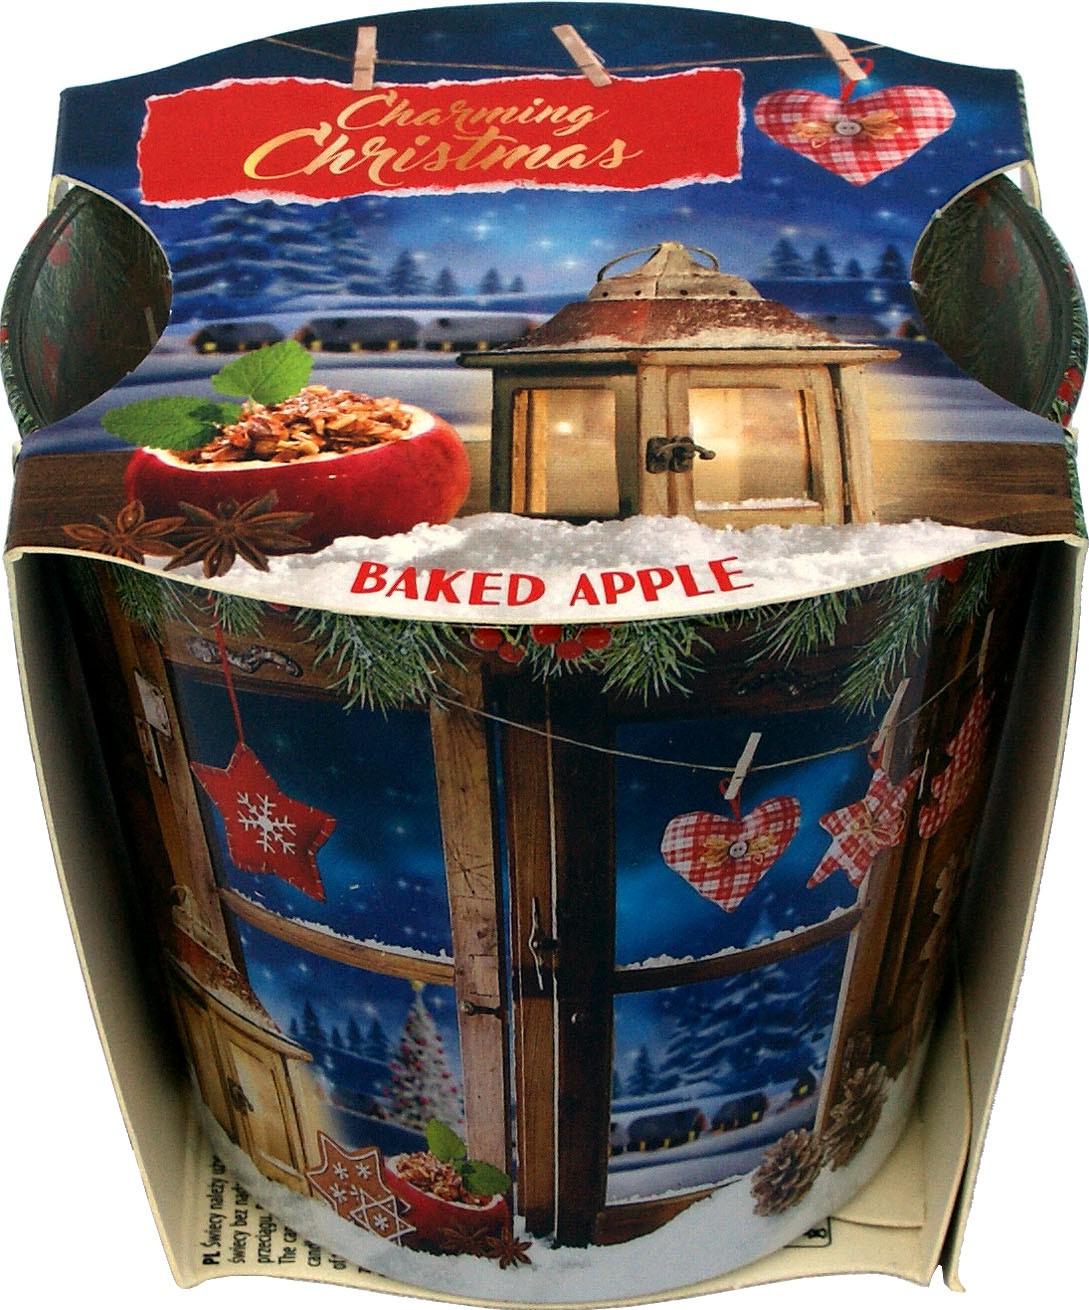 Knox Duftkerze im Glas Charming Christmas - Bratapfel